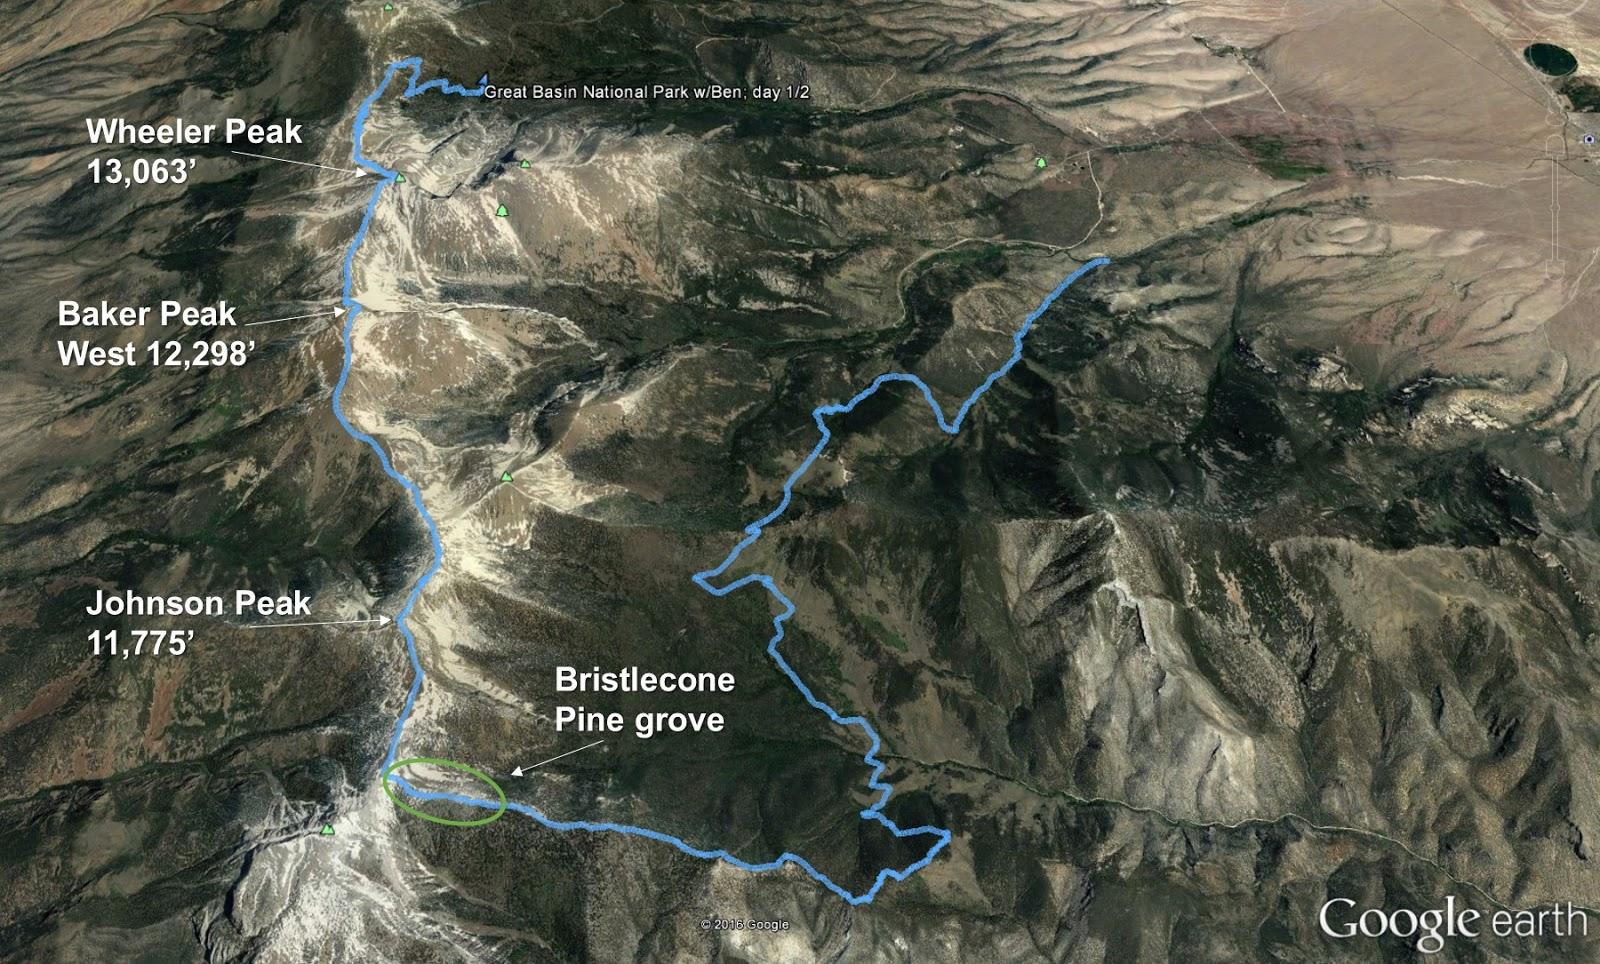 Seeking Ultra Great Basin National Park Nevada 2016